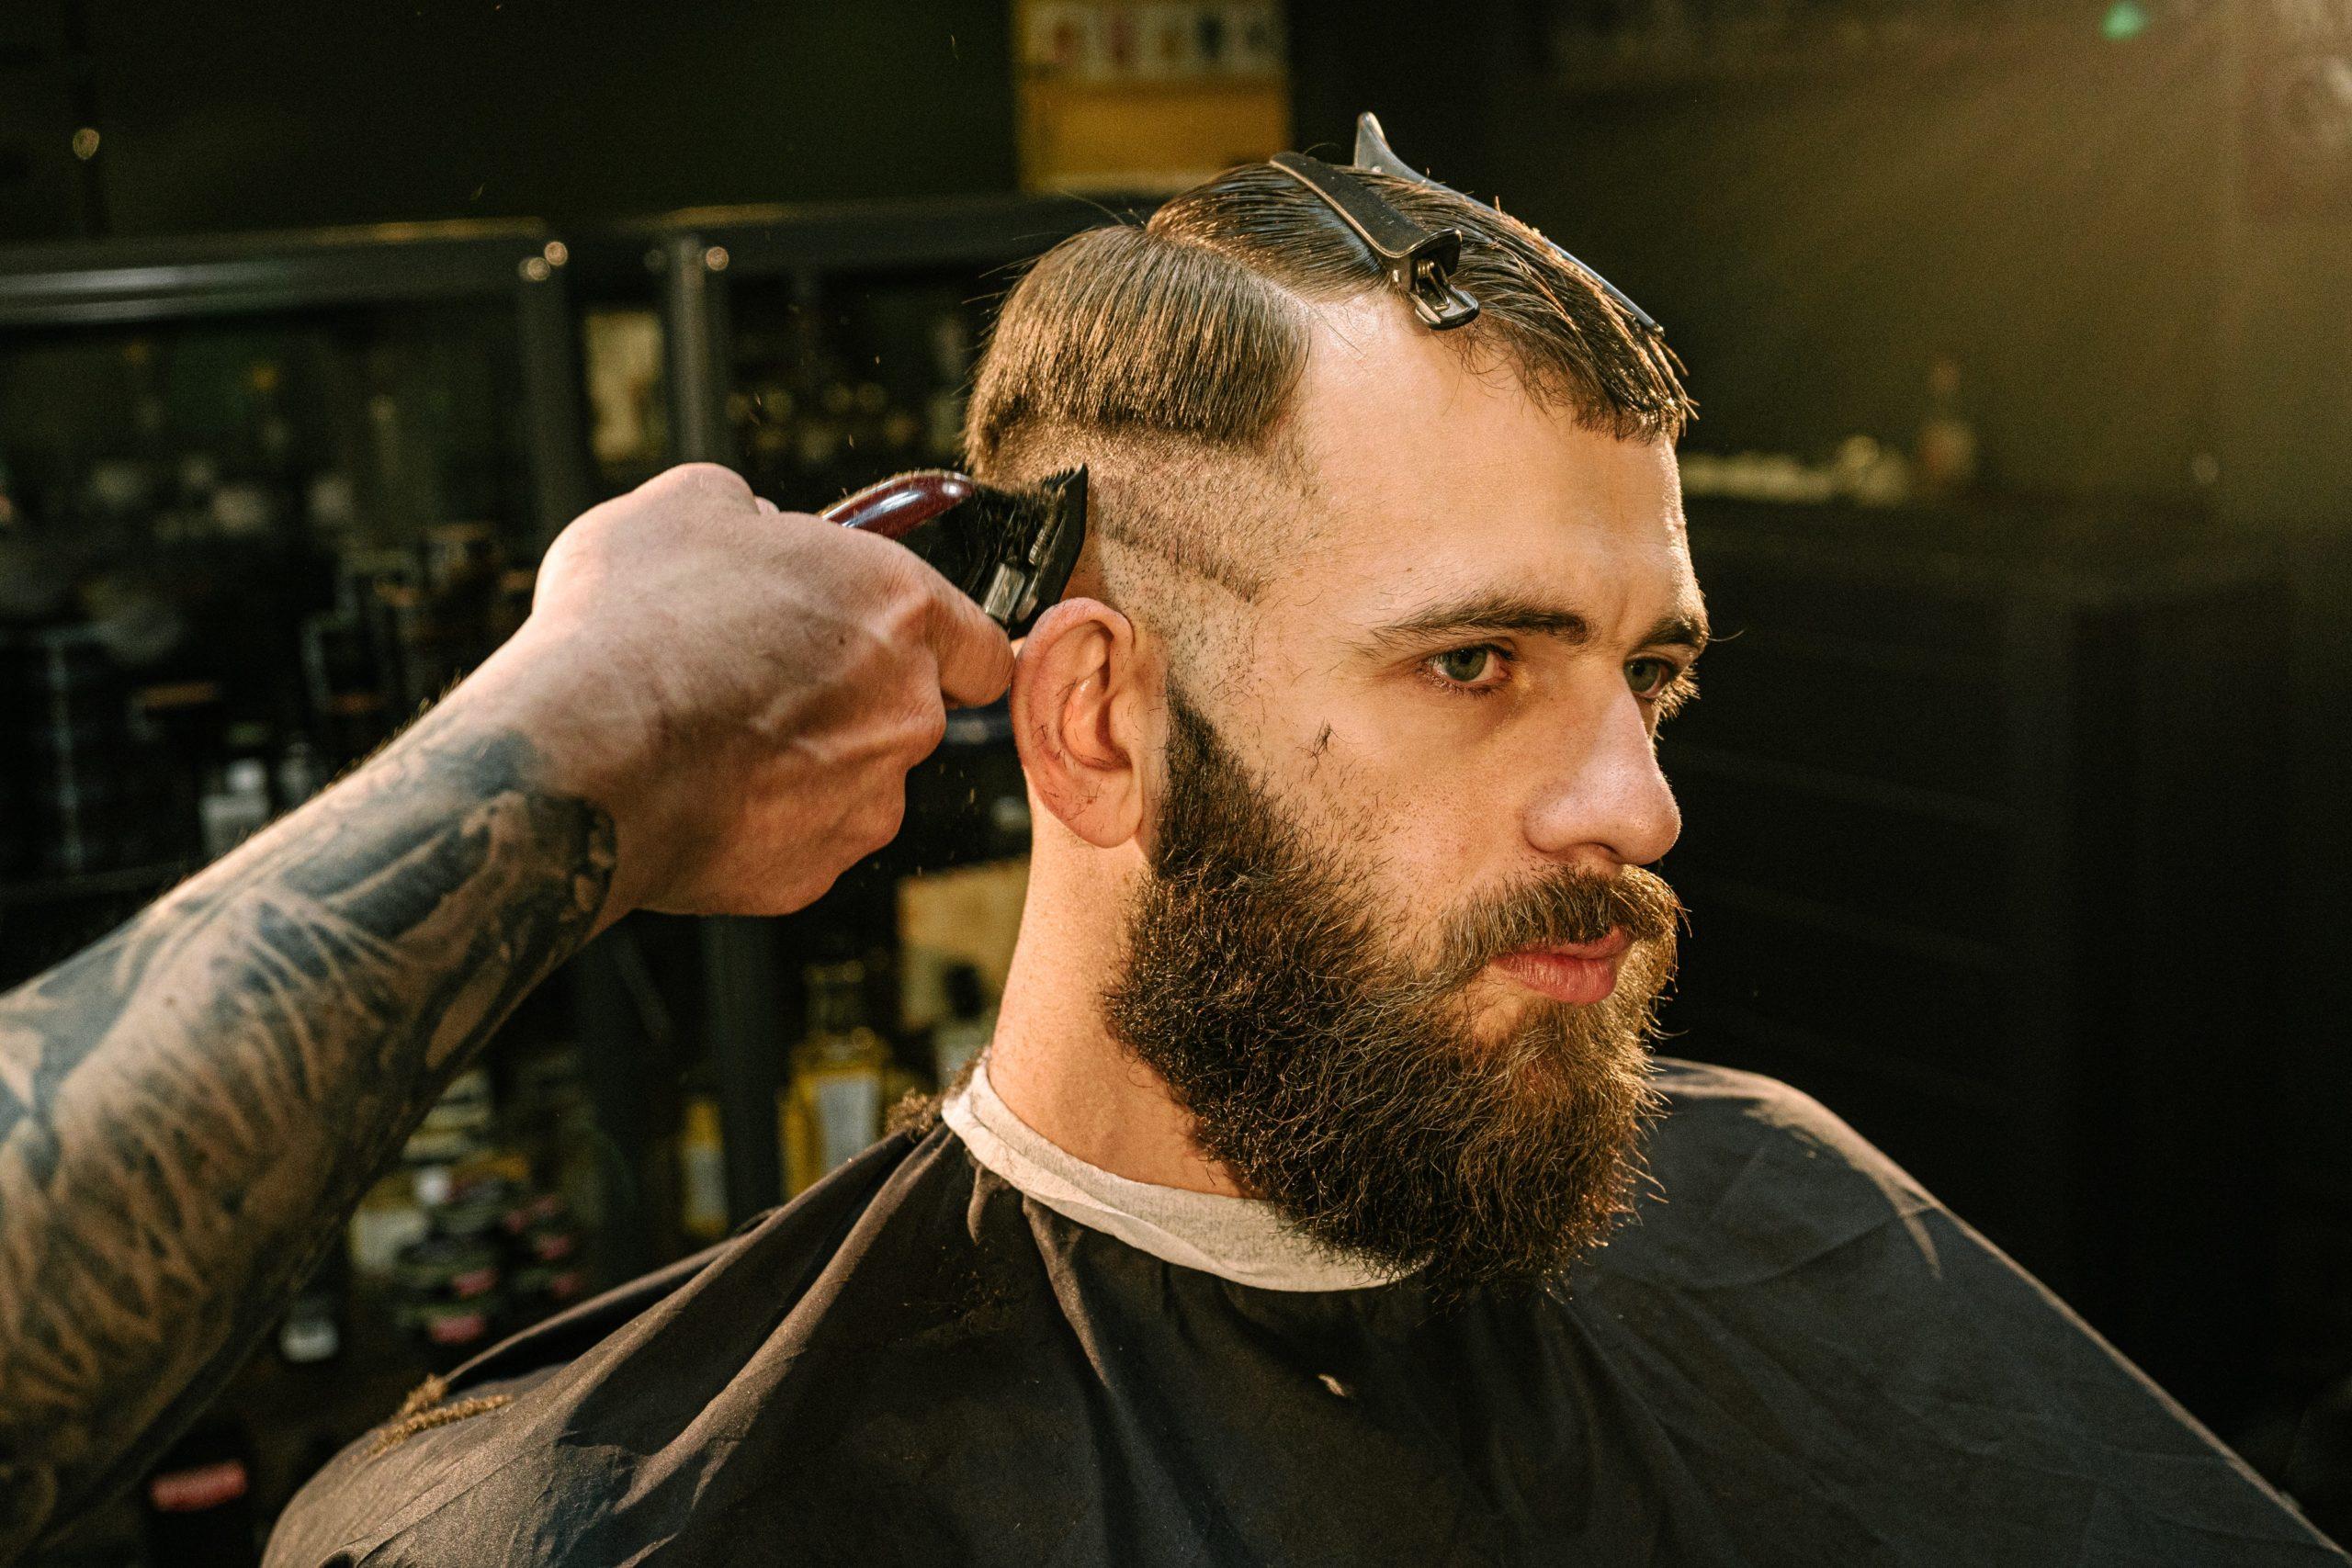 barber using electric razor